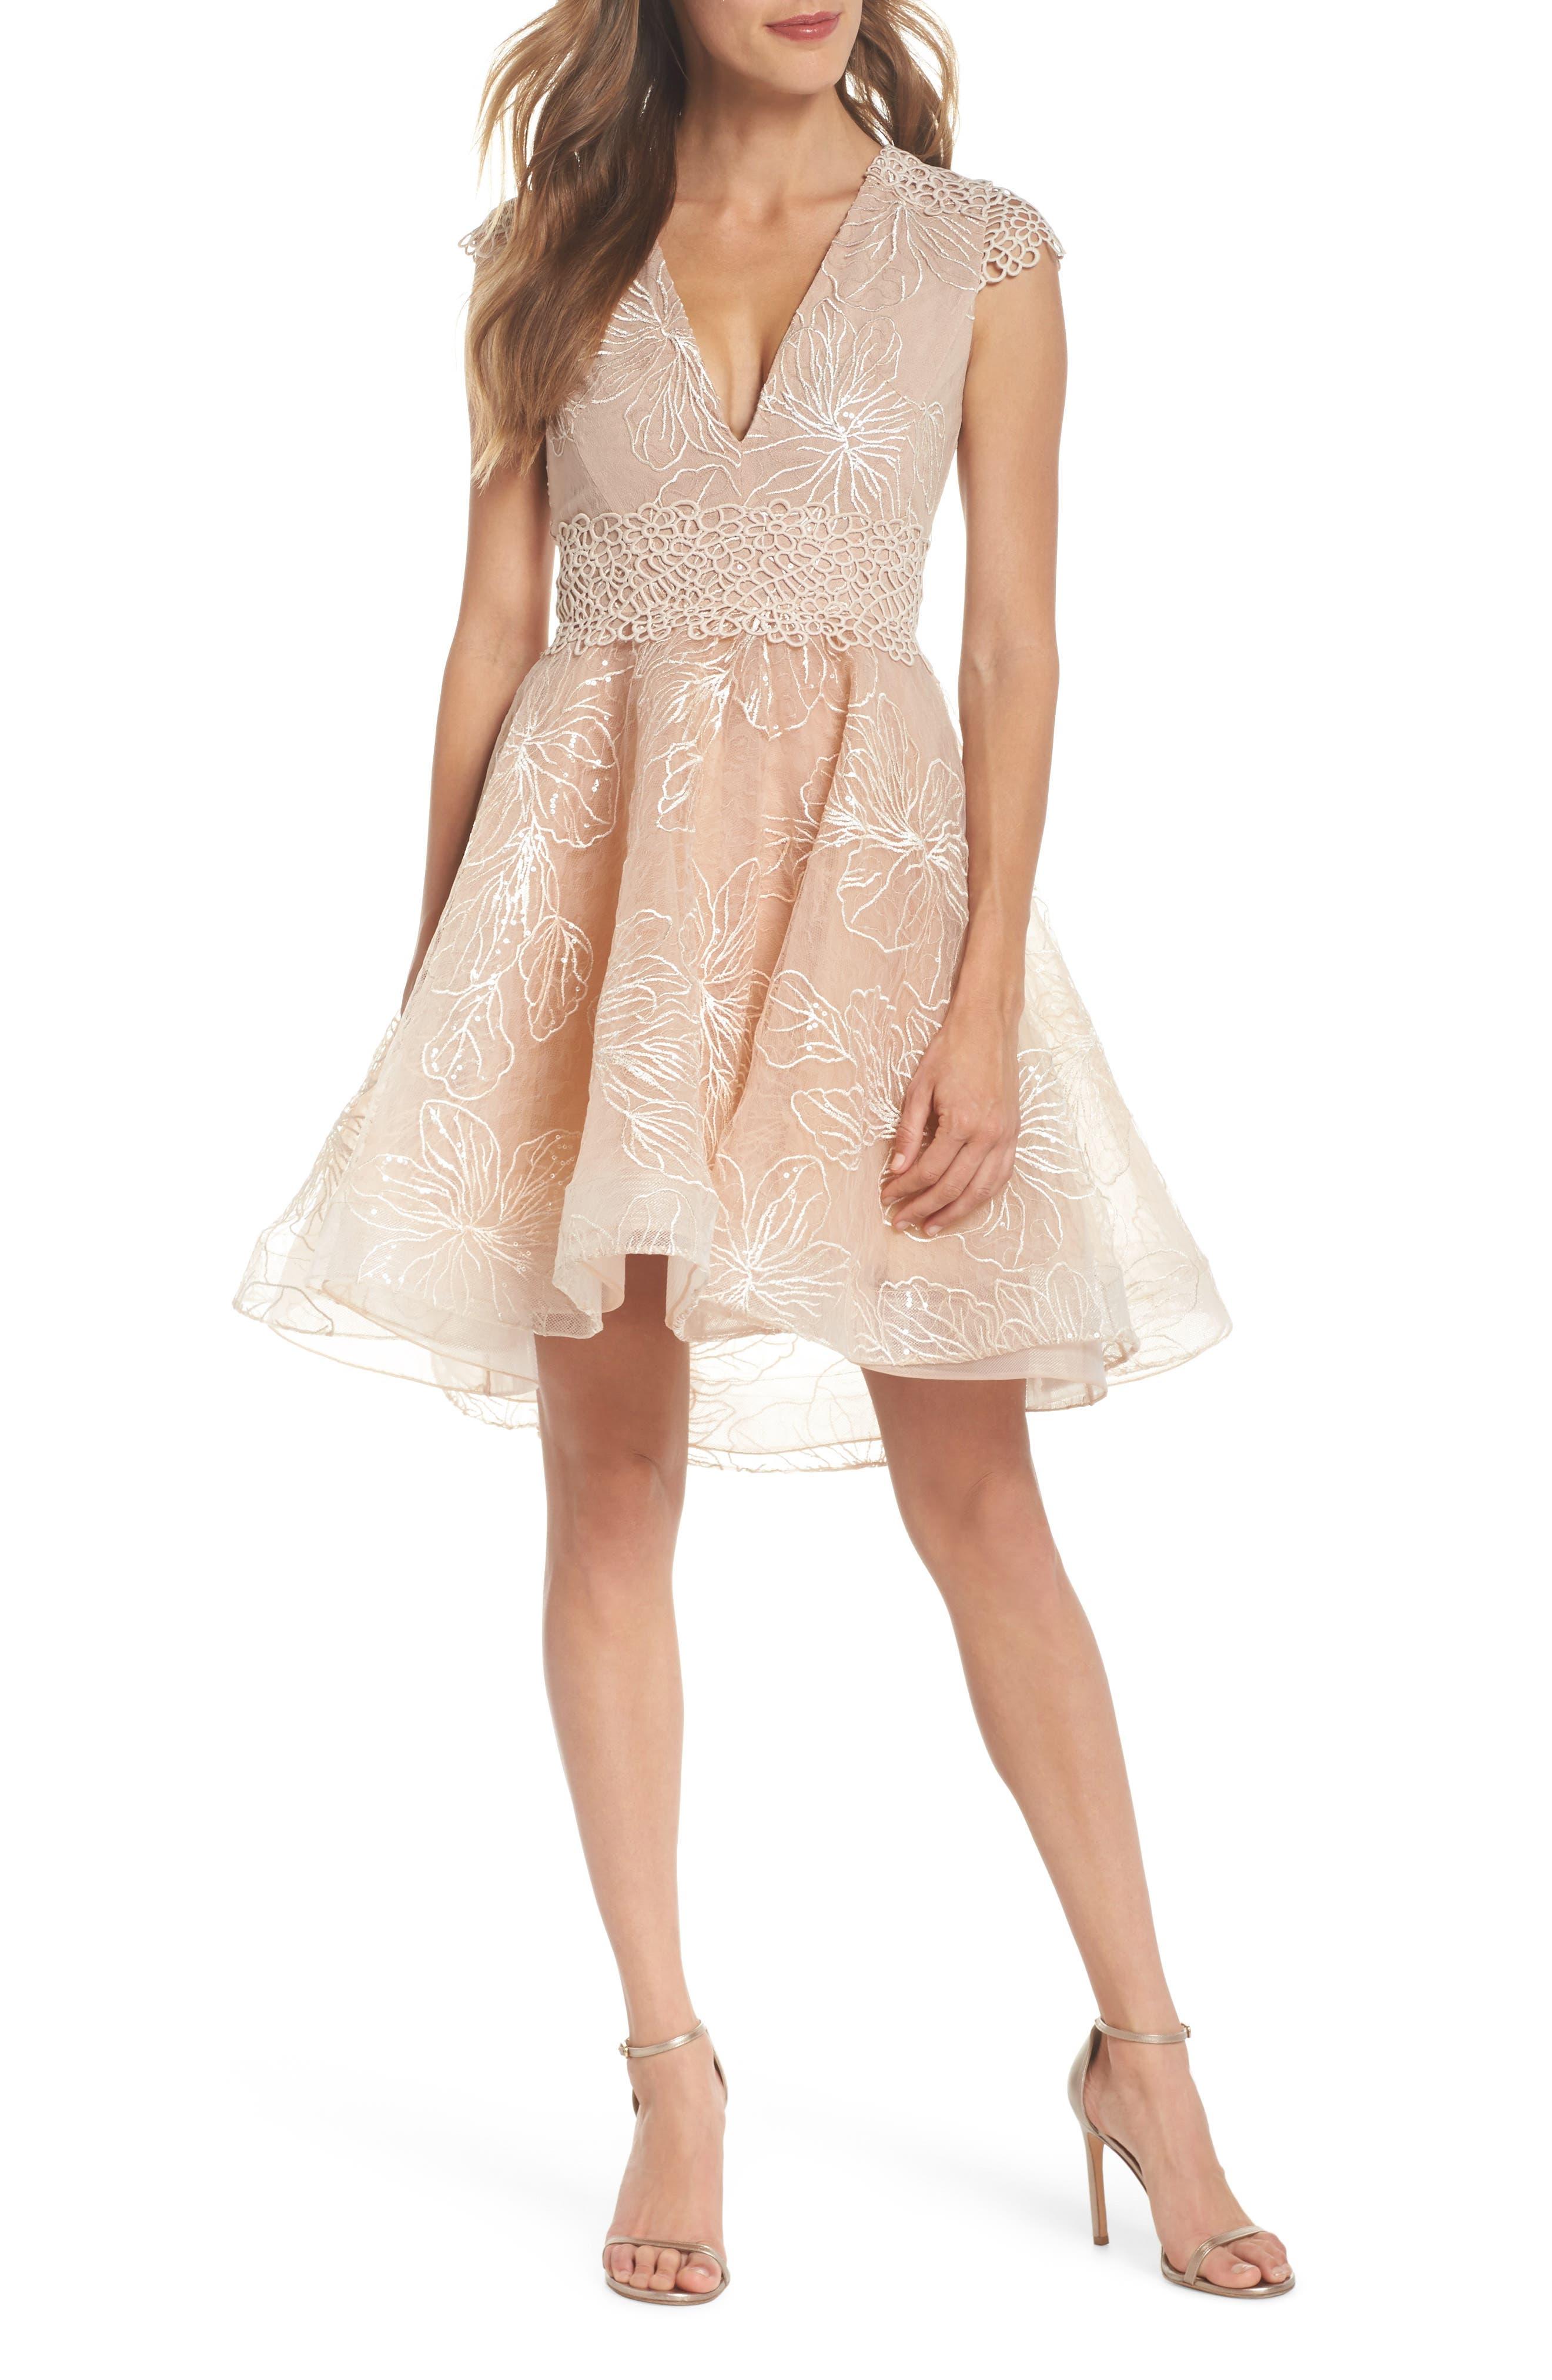 Fiore Sequin Fit & Flare Dress,                         Main,                         color, Beige